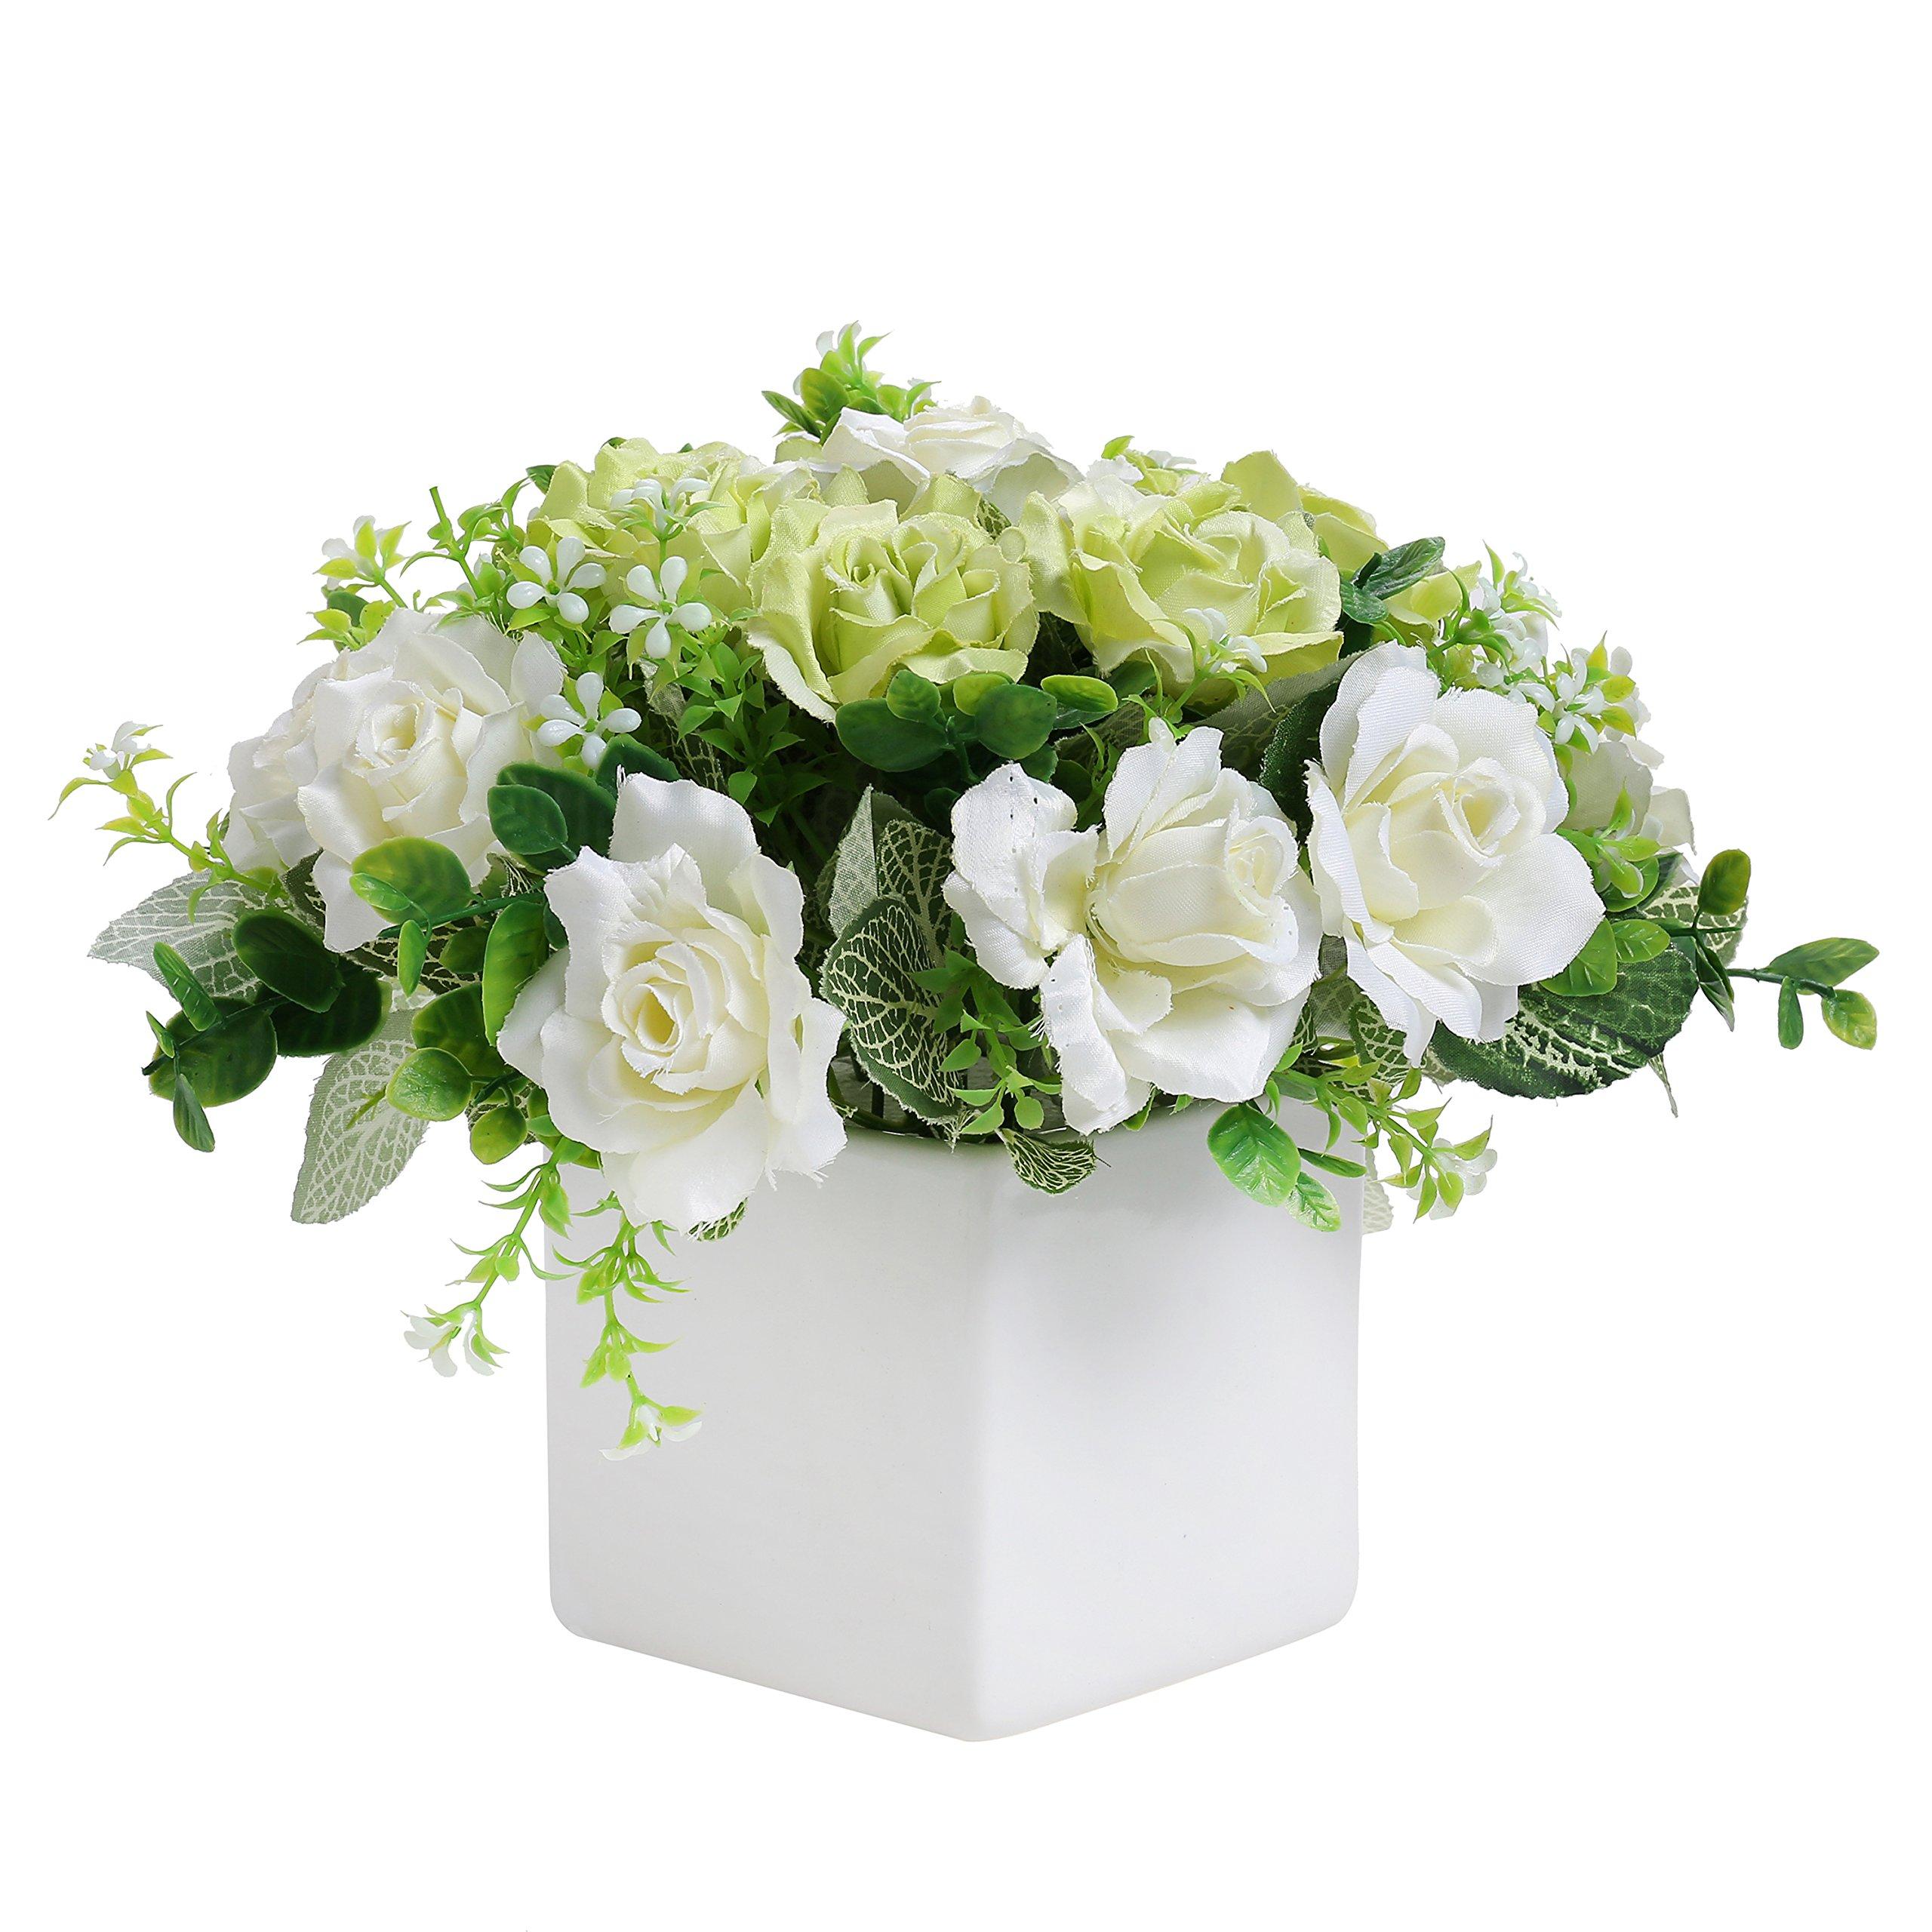 225 & Small Flower Arrangements: Amazon.com